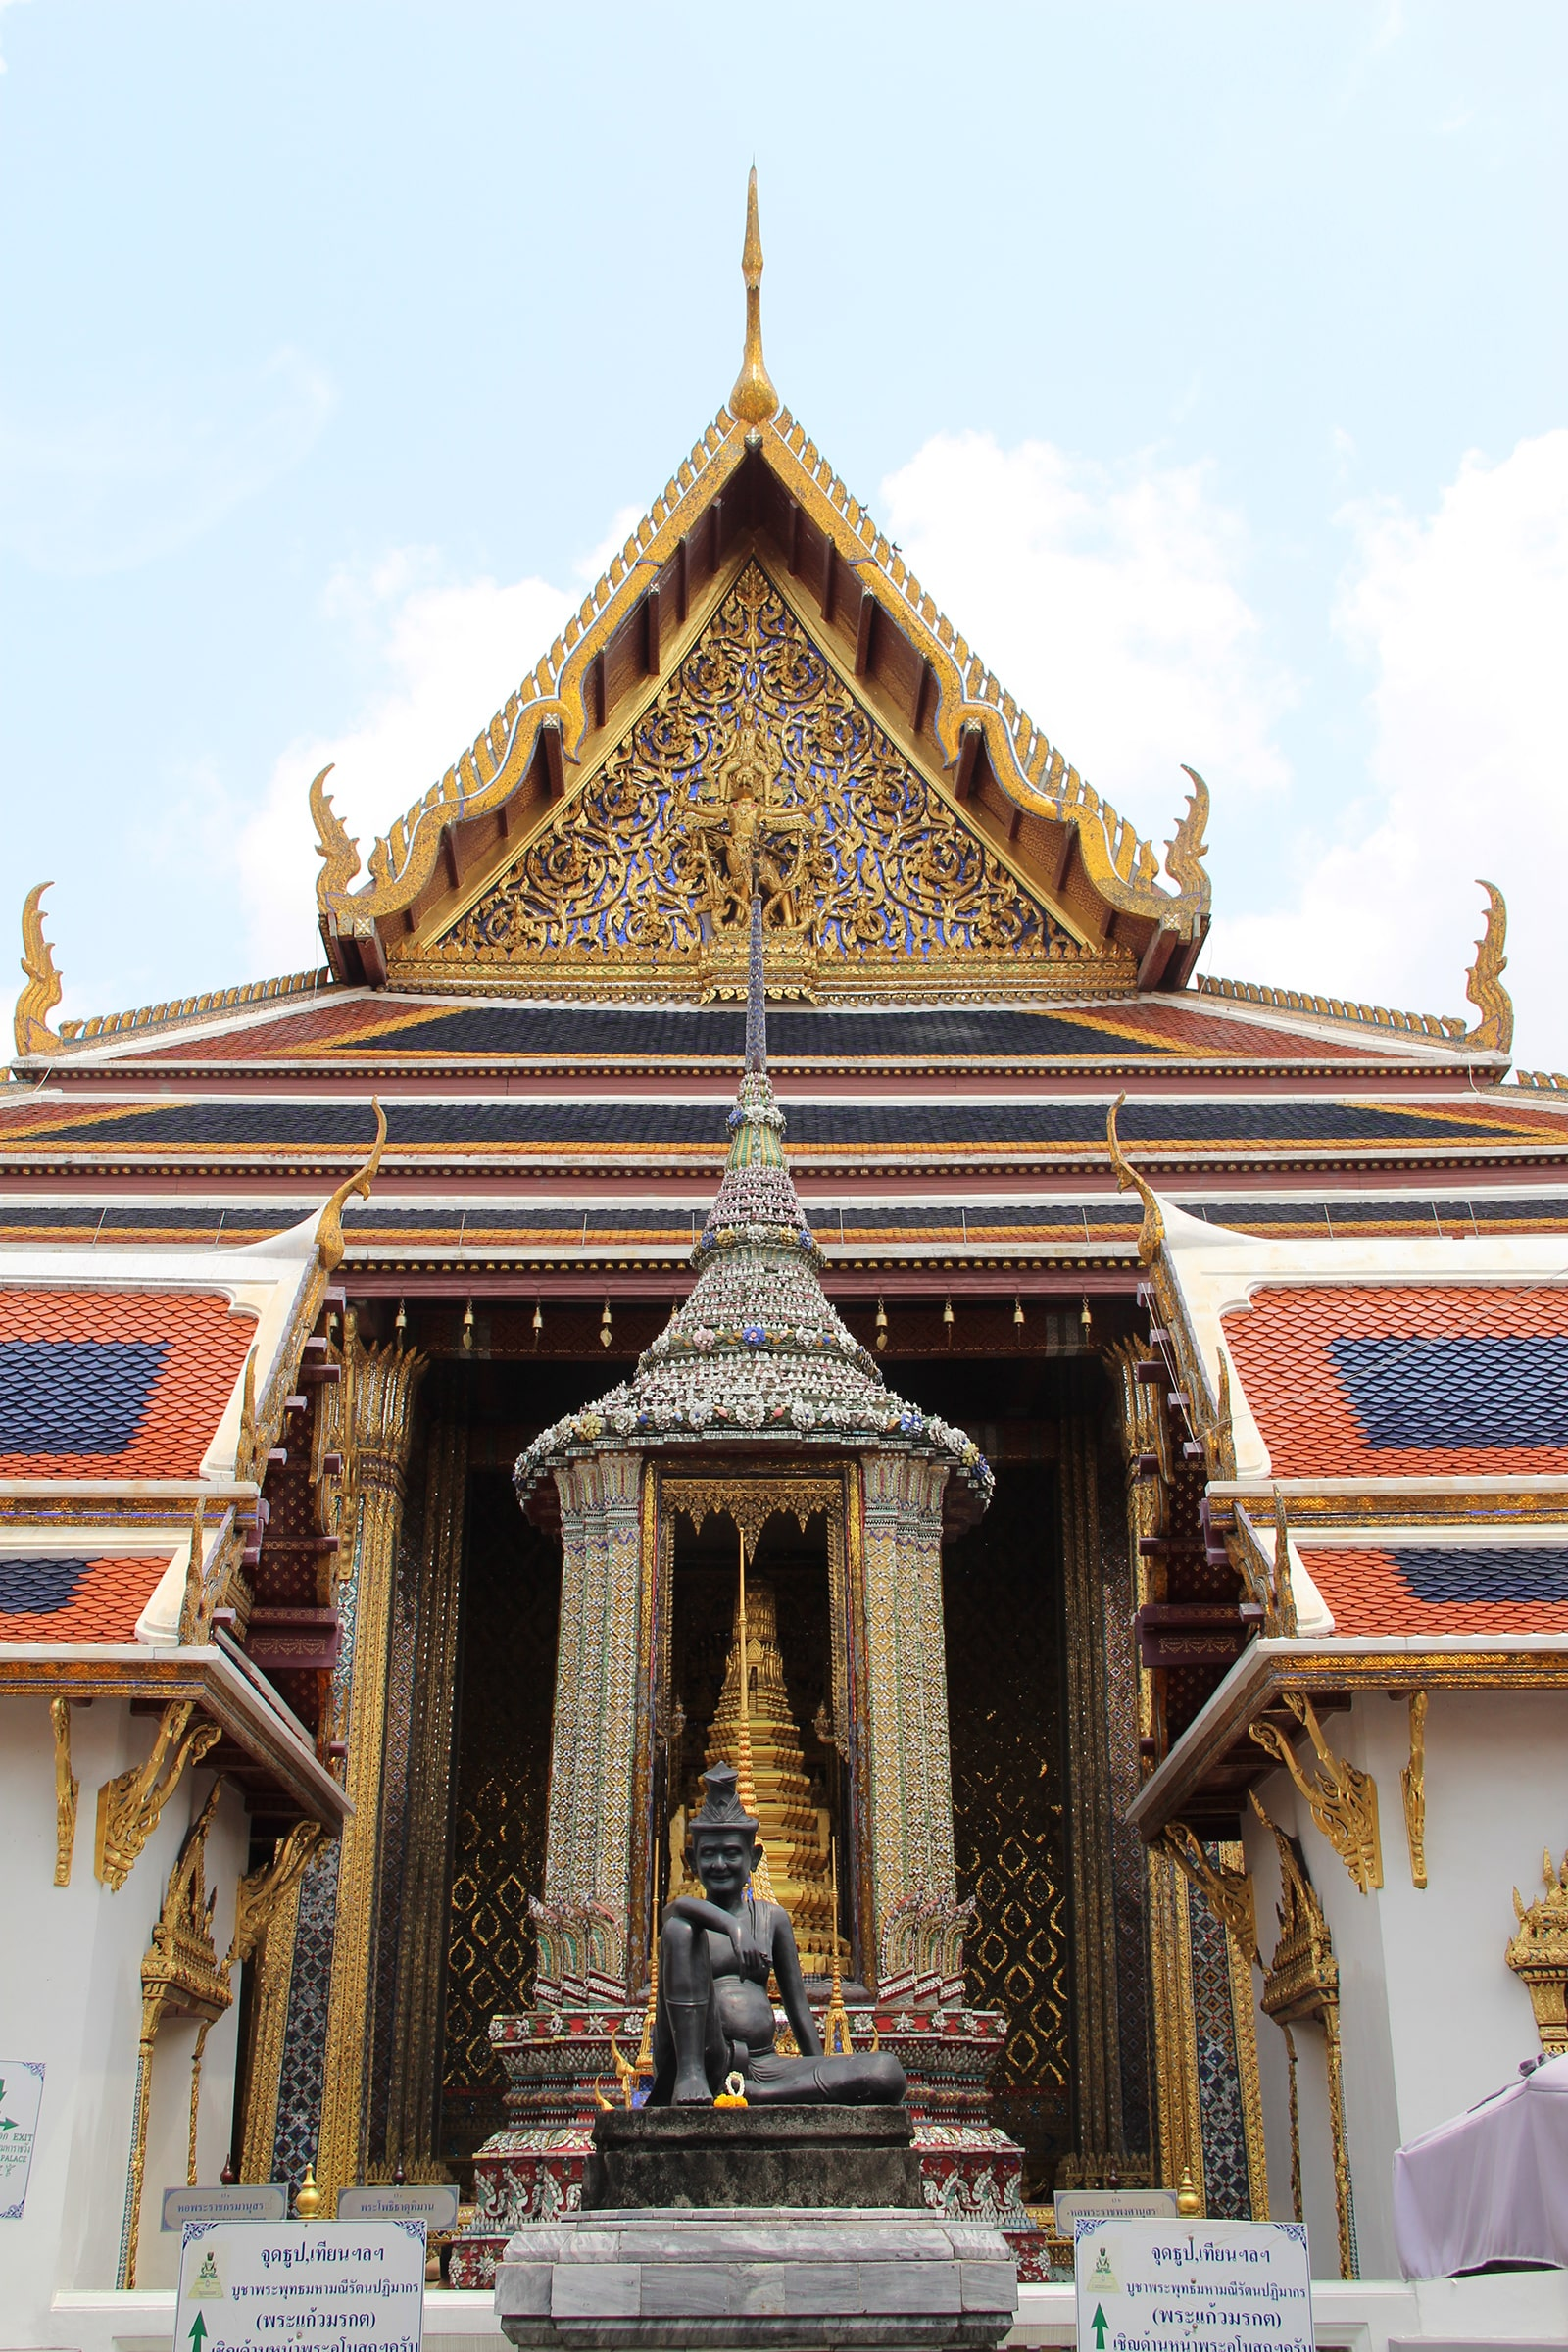 Entrata del complesso di Wat Pho